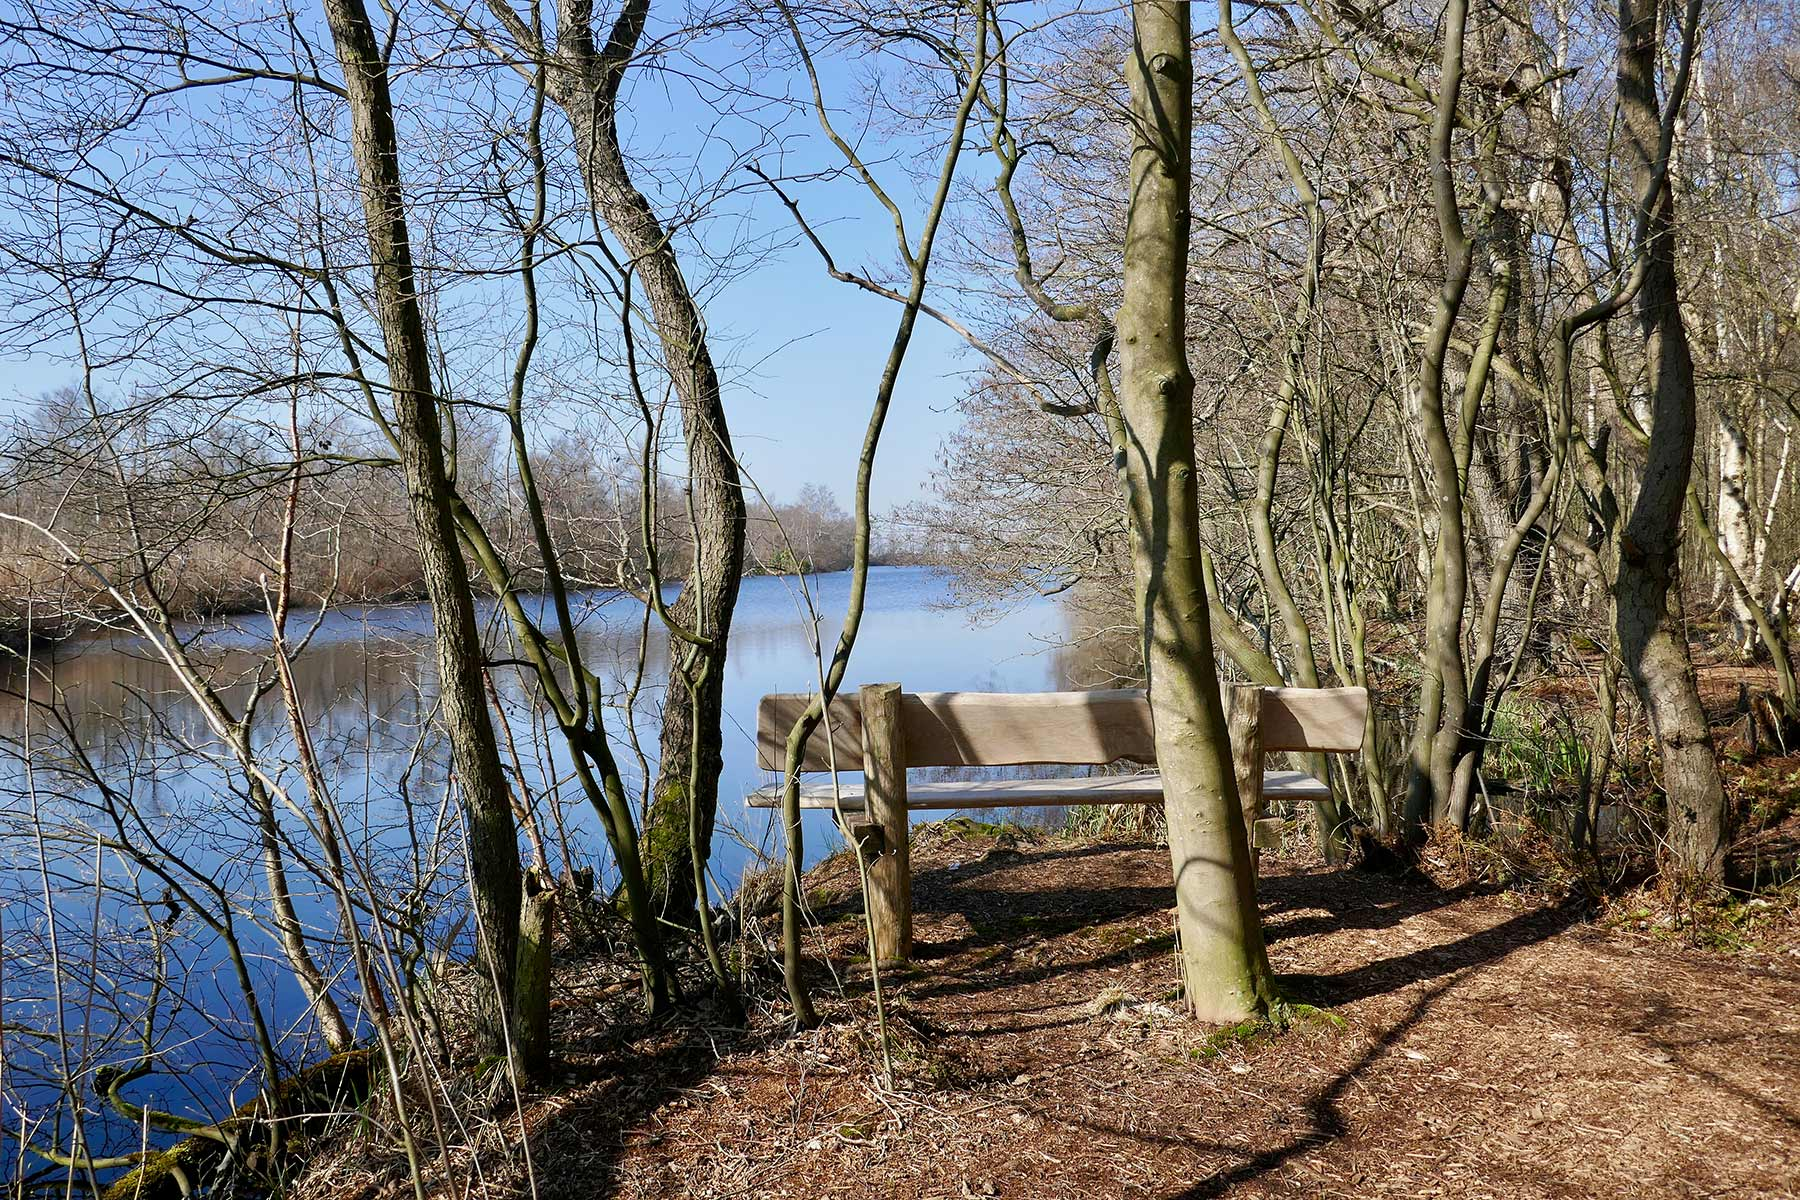 malta-lusthof-de-haeck-wandelen